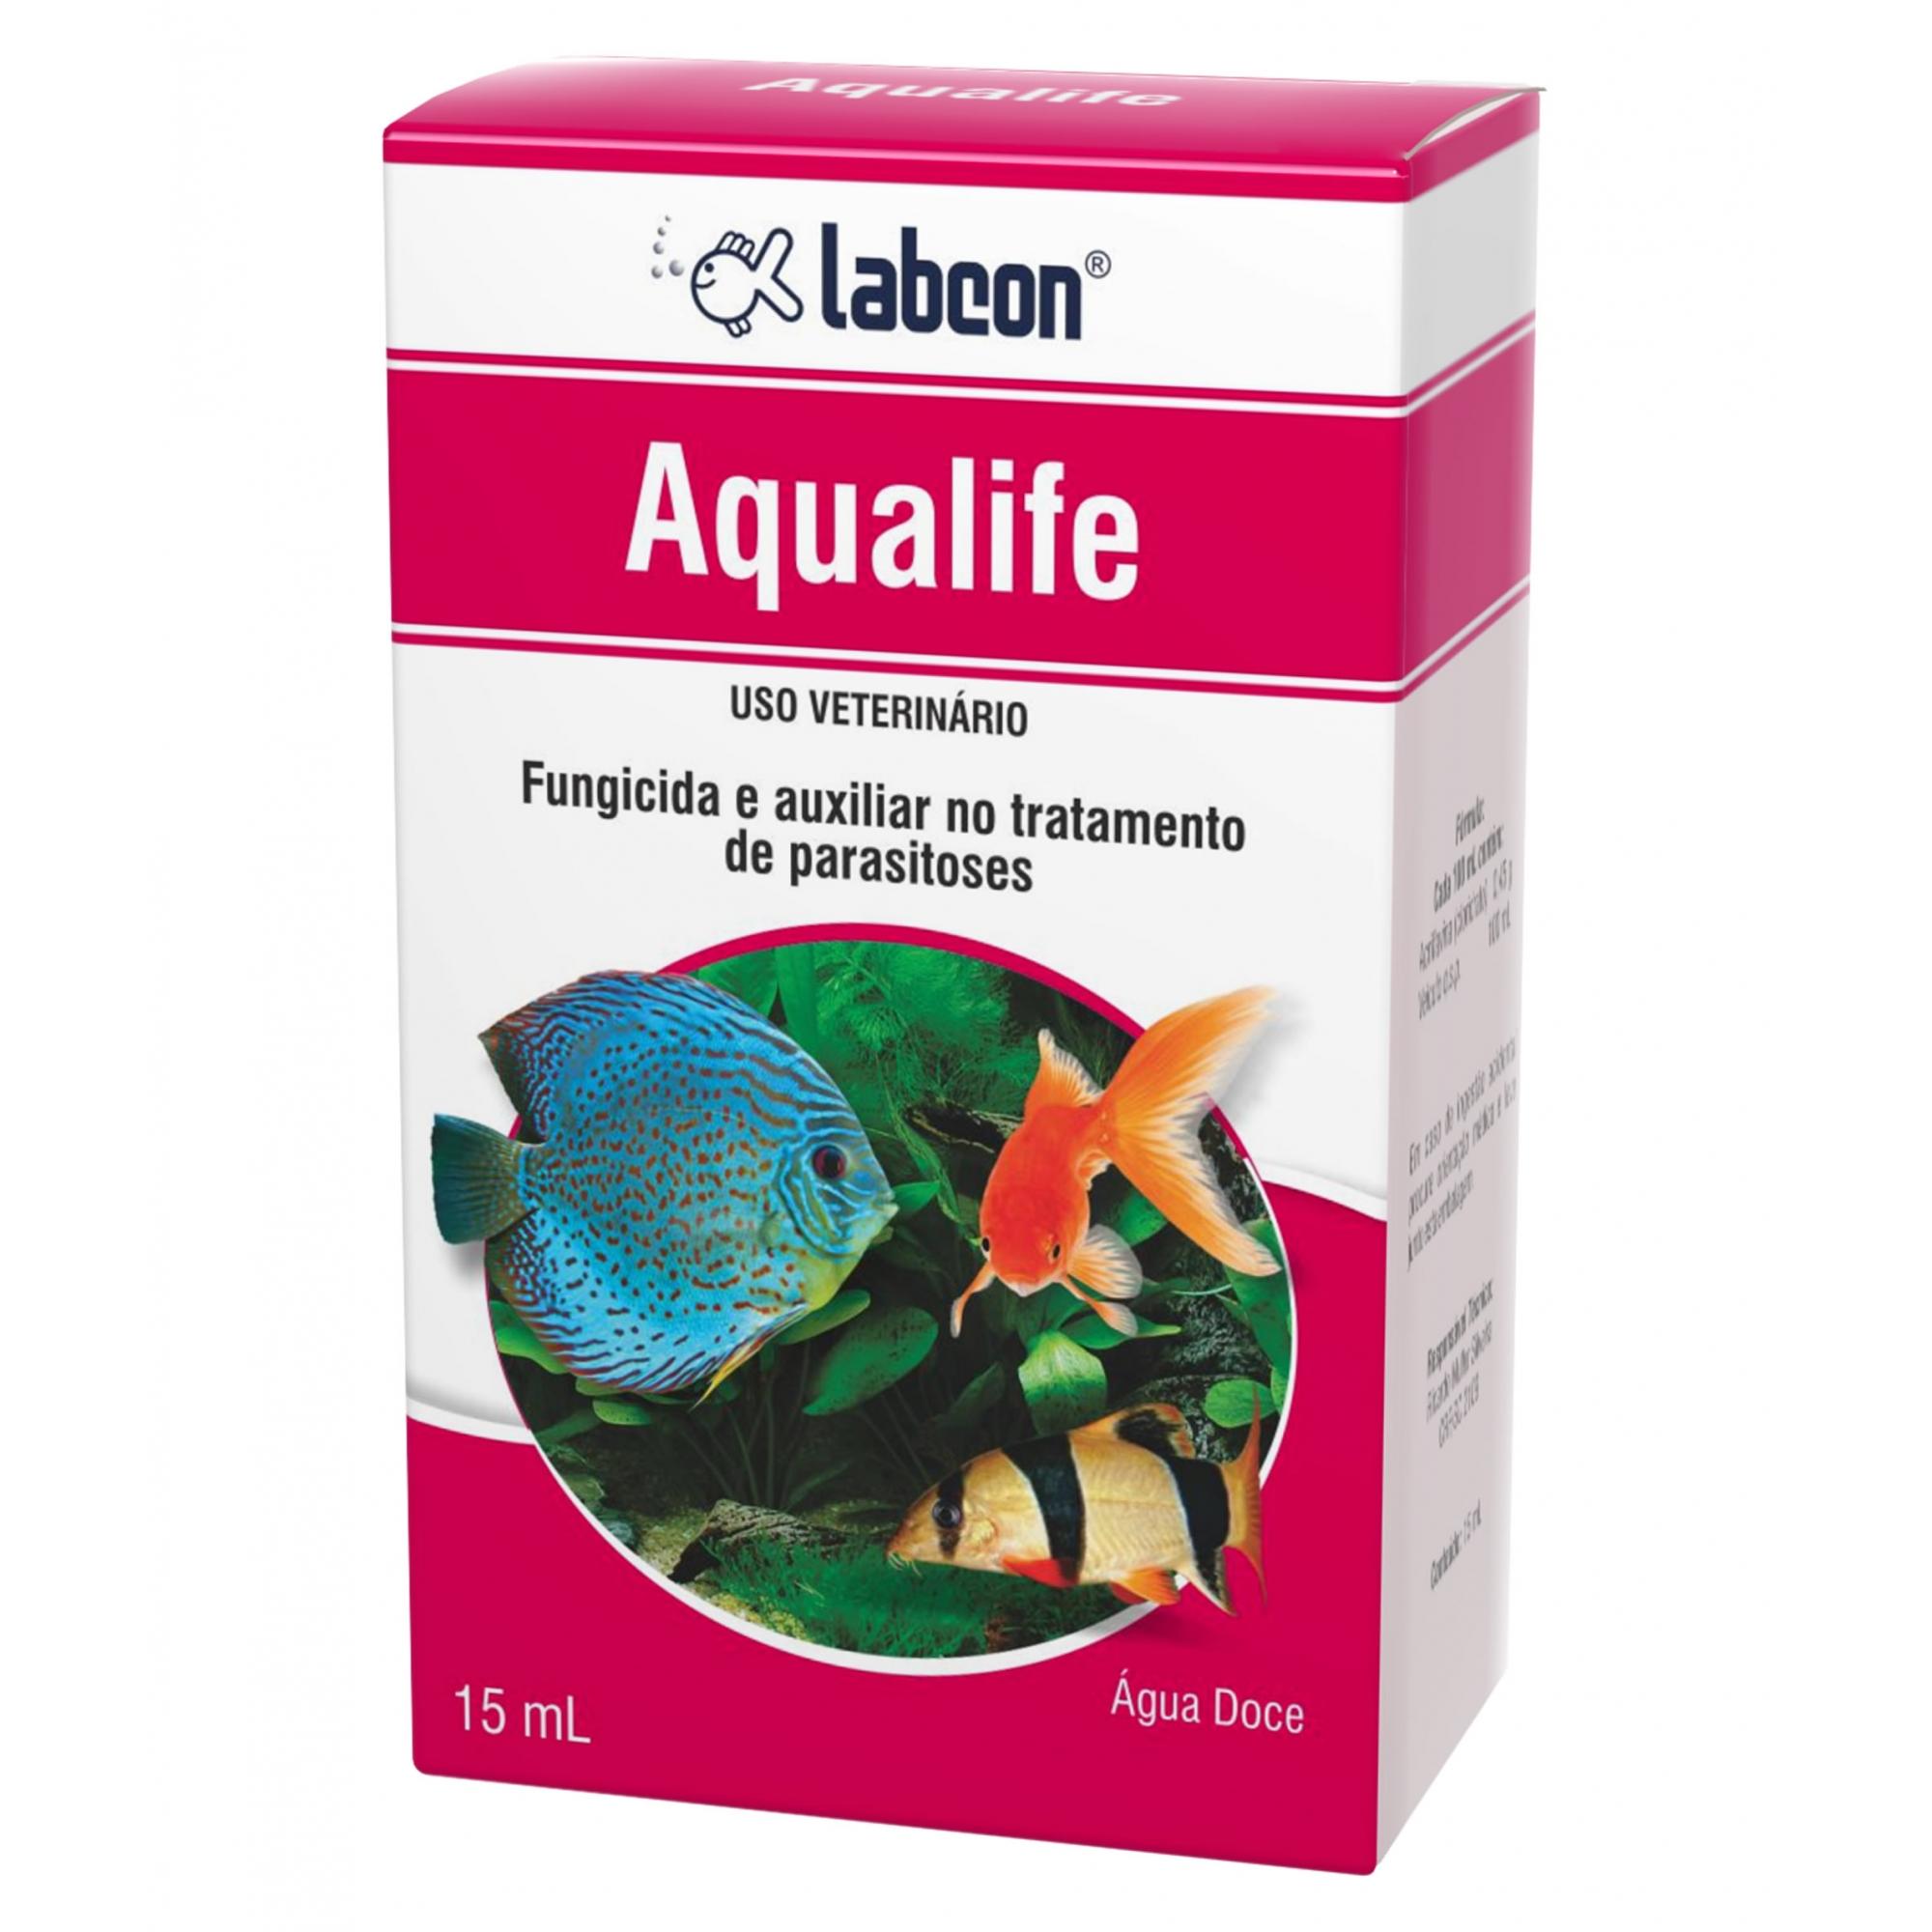 Alcon Labcon Fungicida Aqualife - 15ML